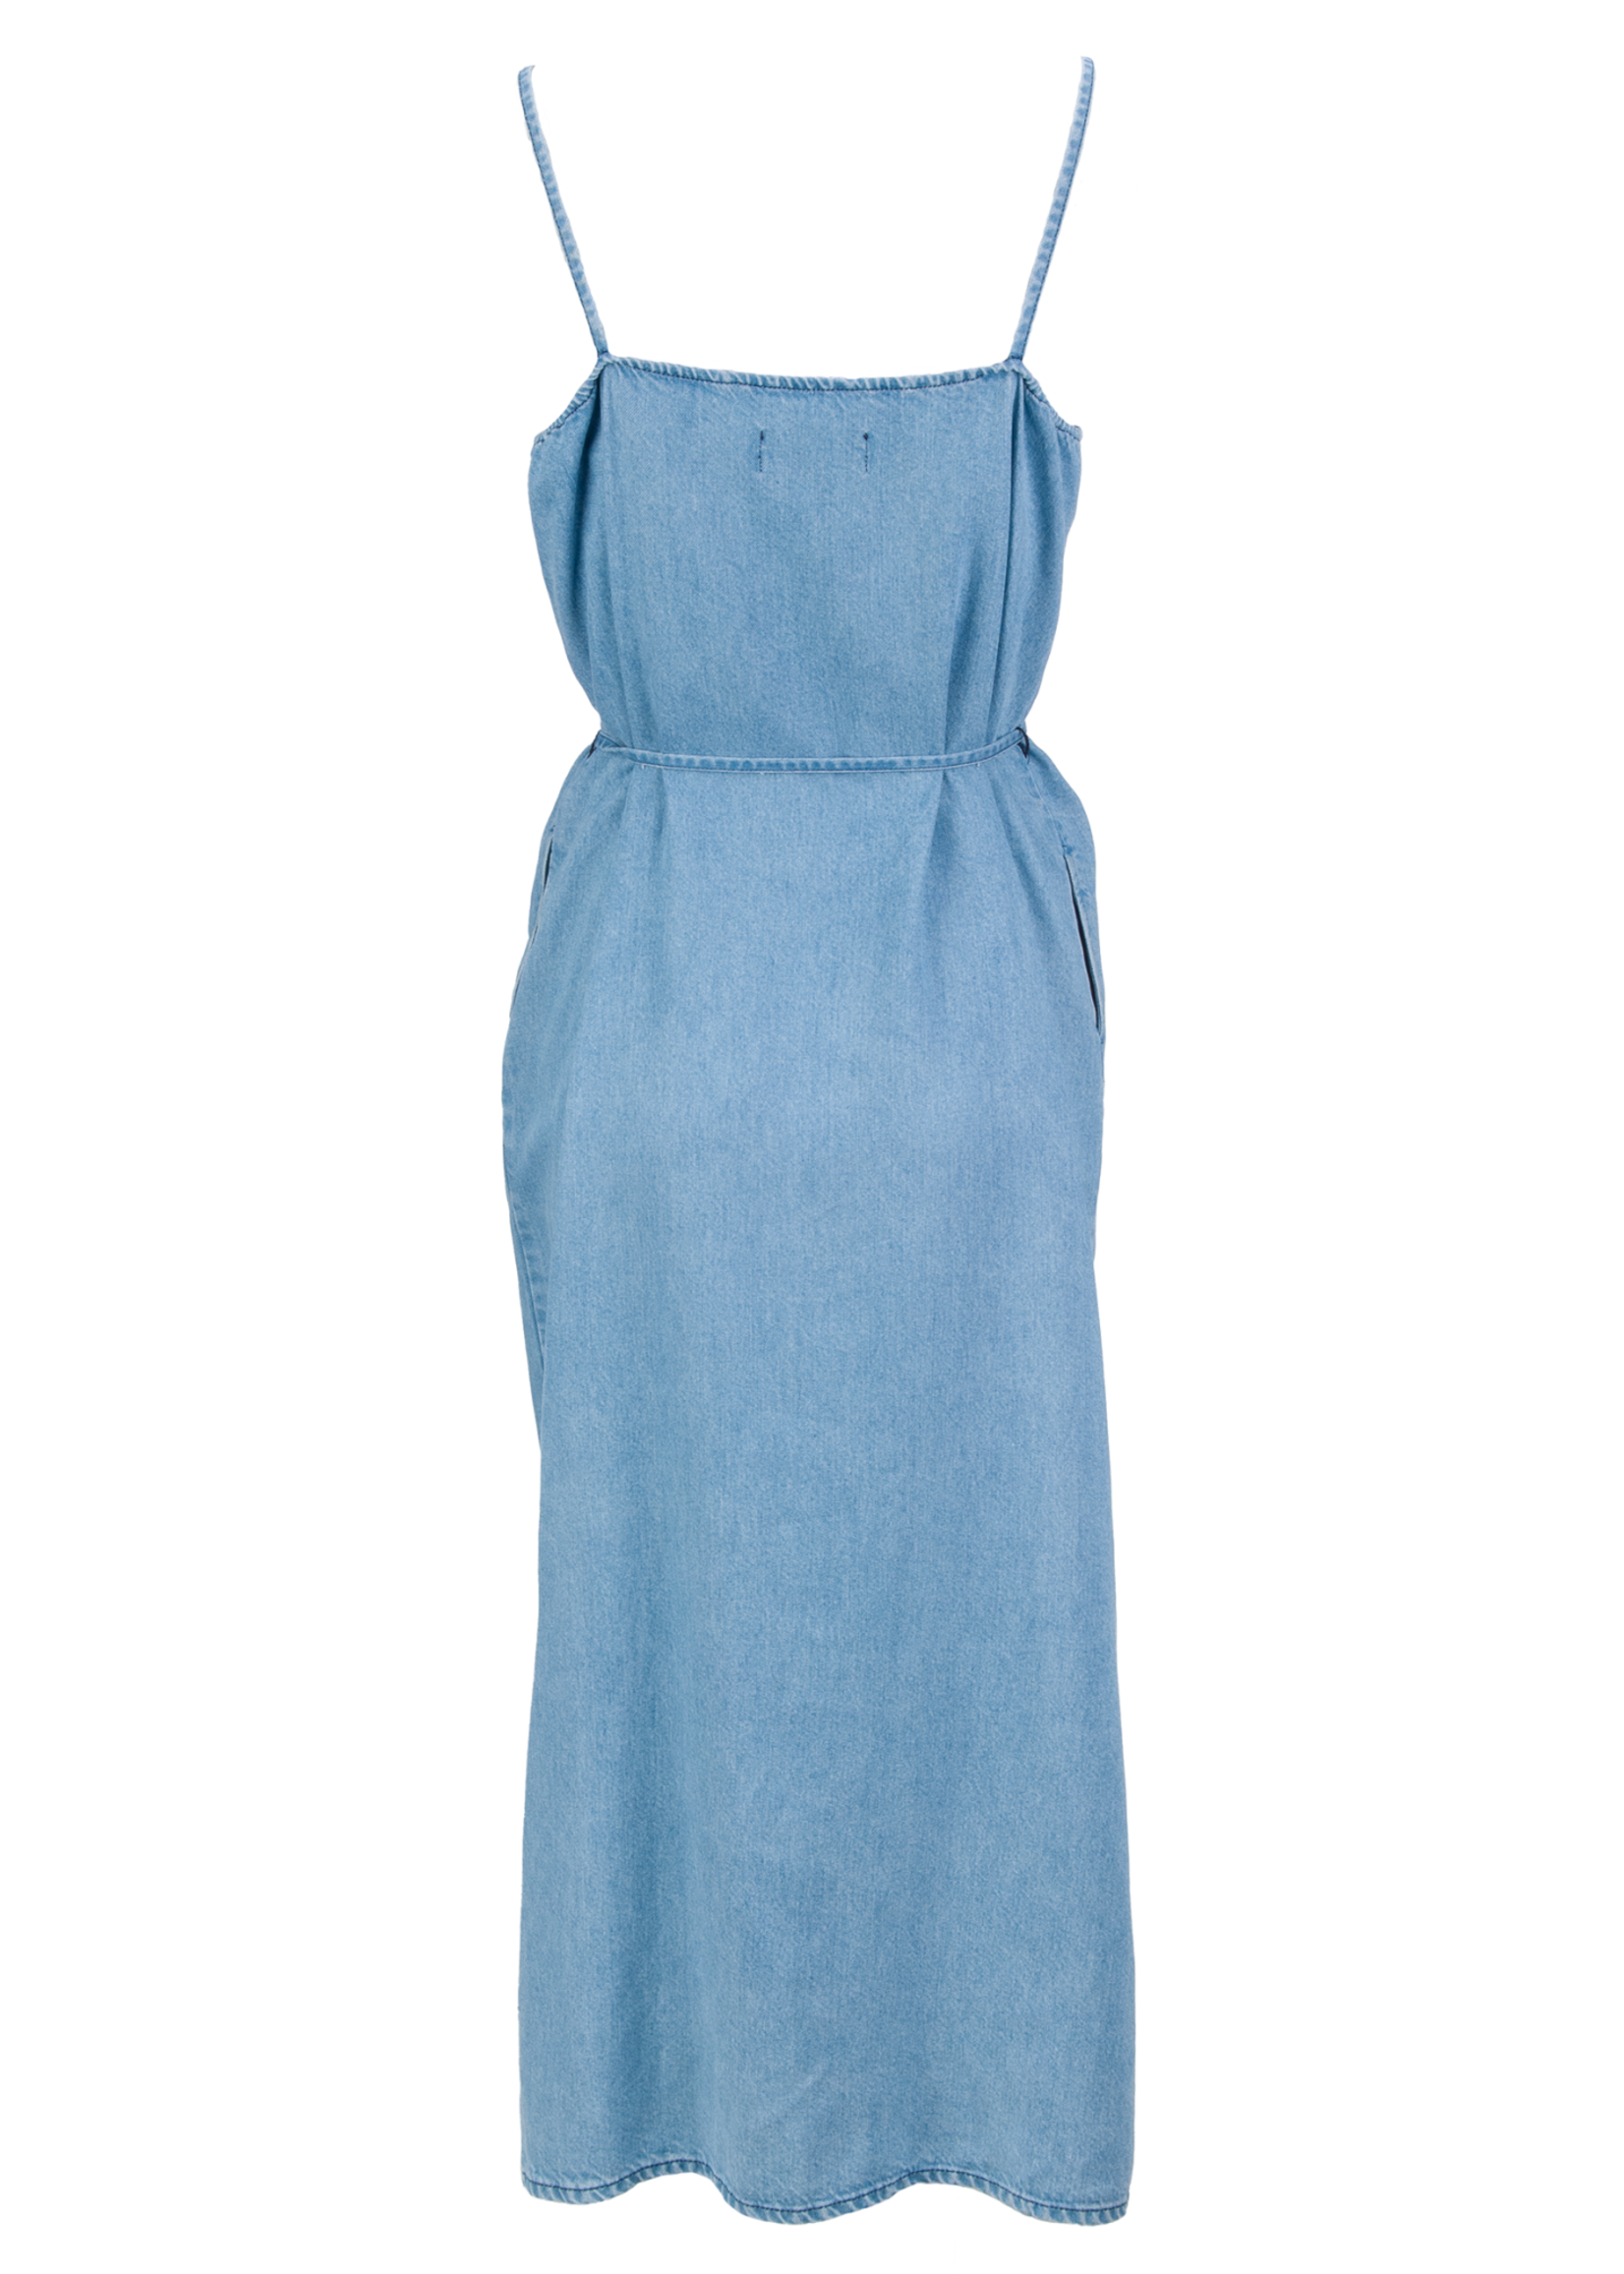 4021 WE Dress